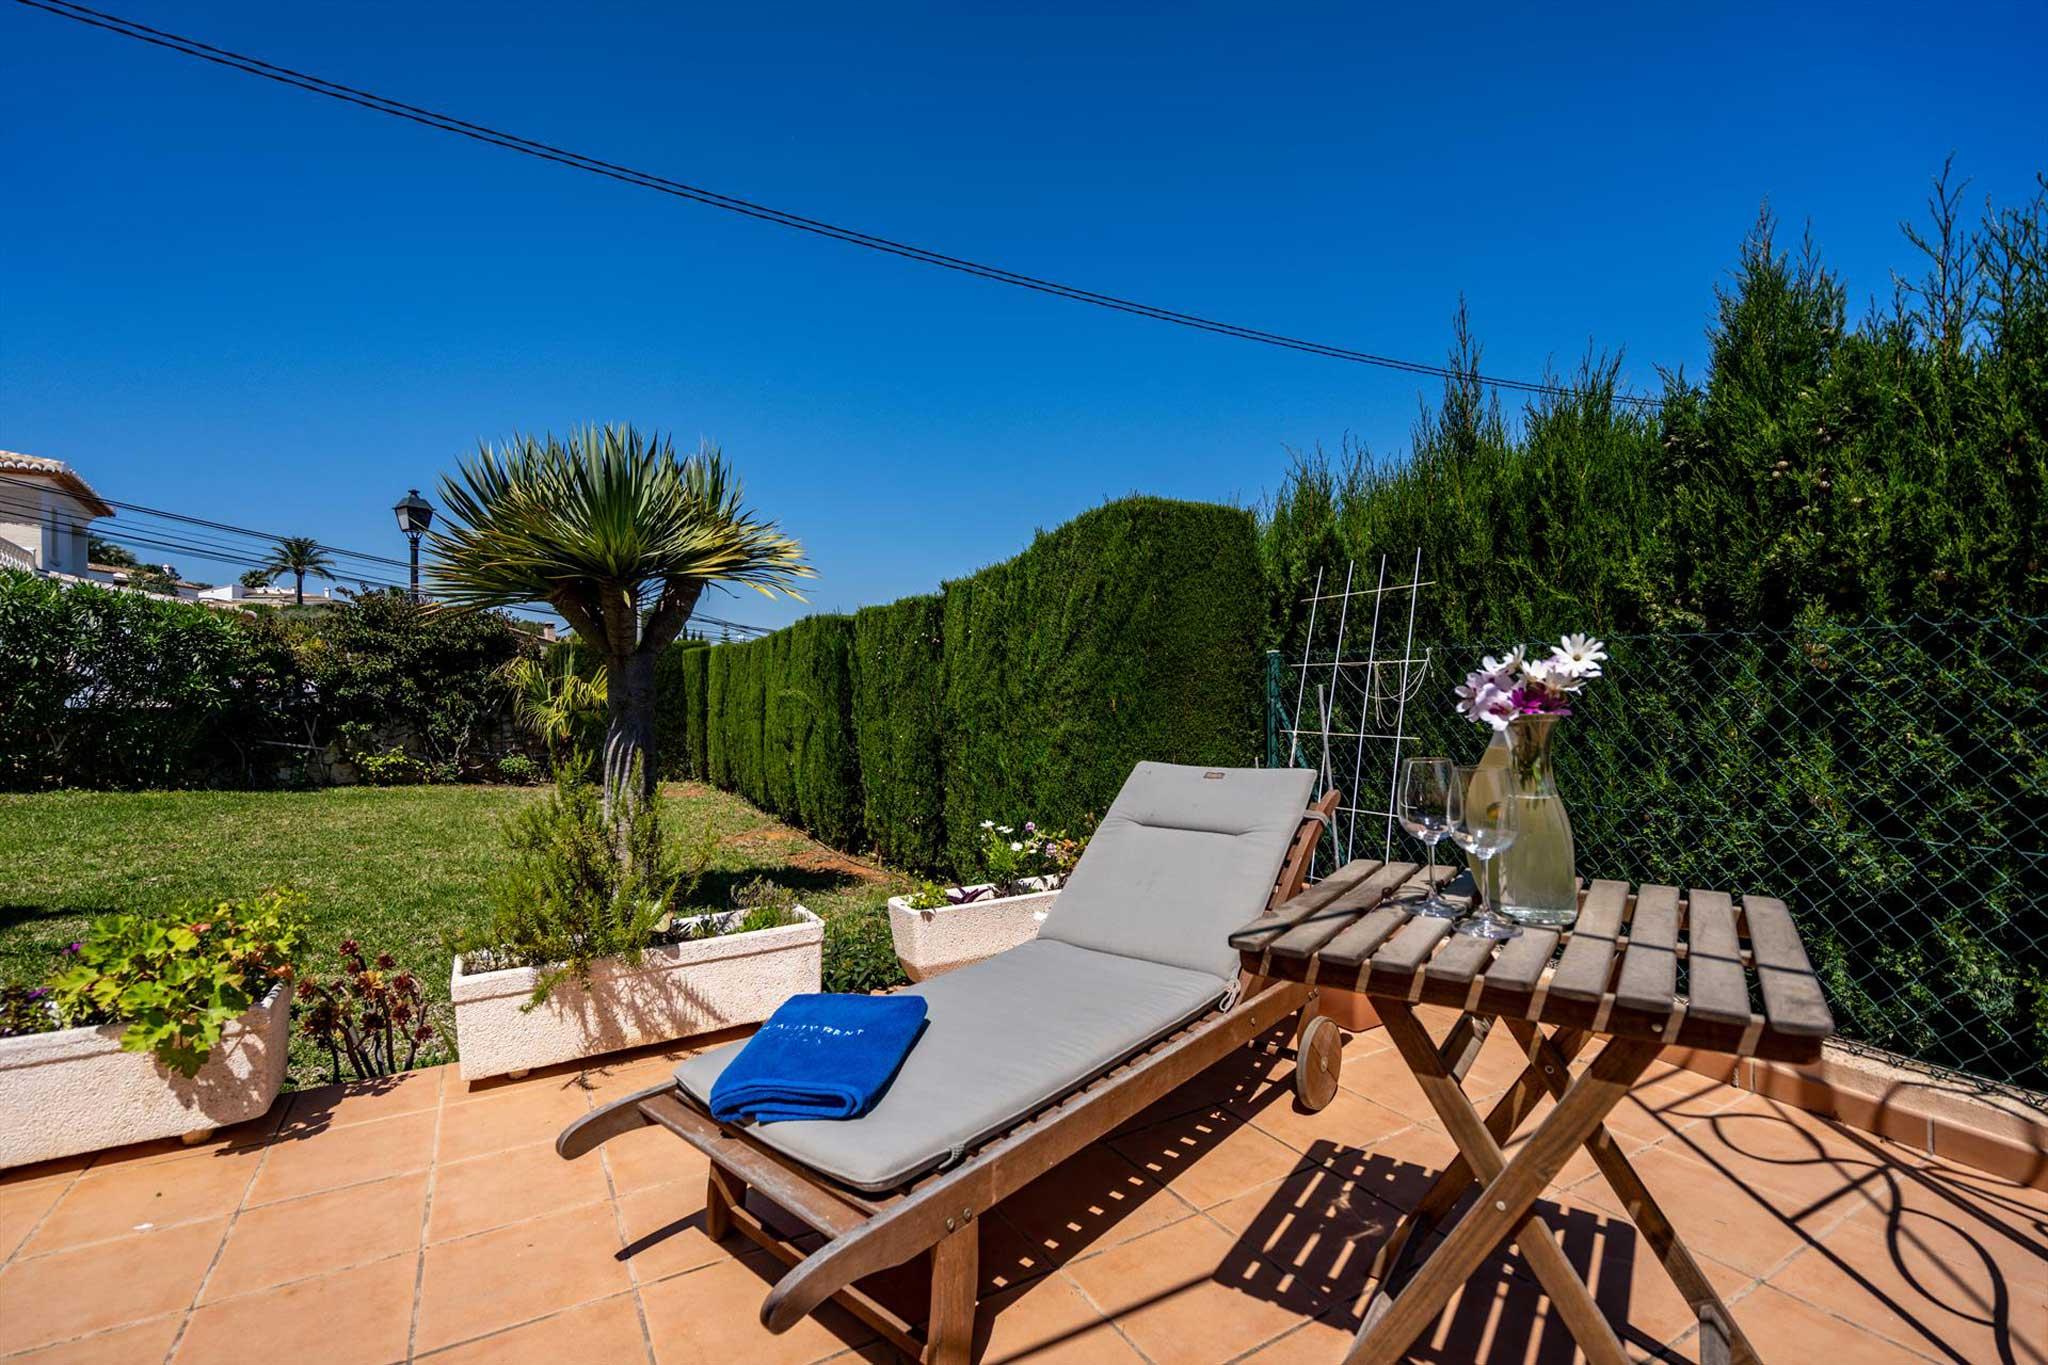 Casa con jardin en Denia – Quality Rent a Villa